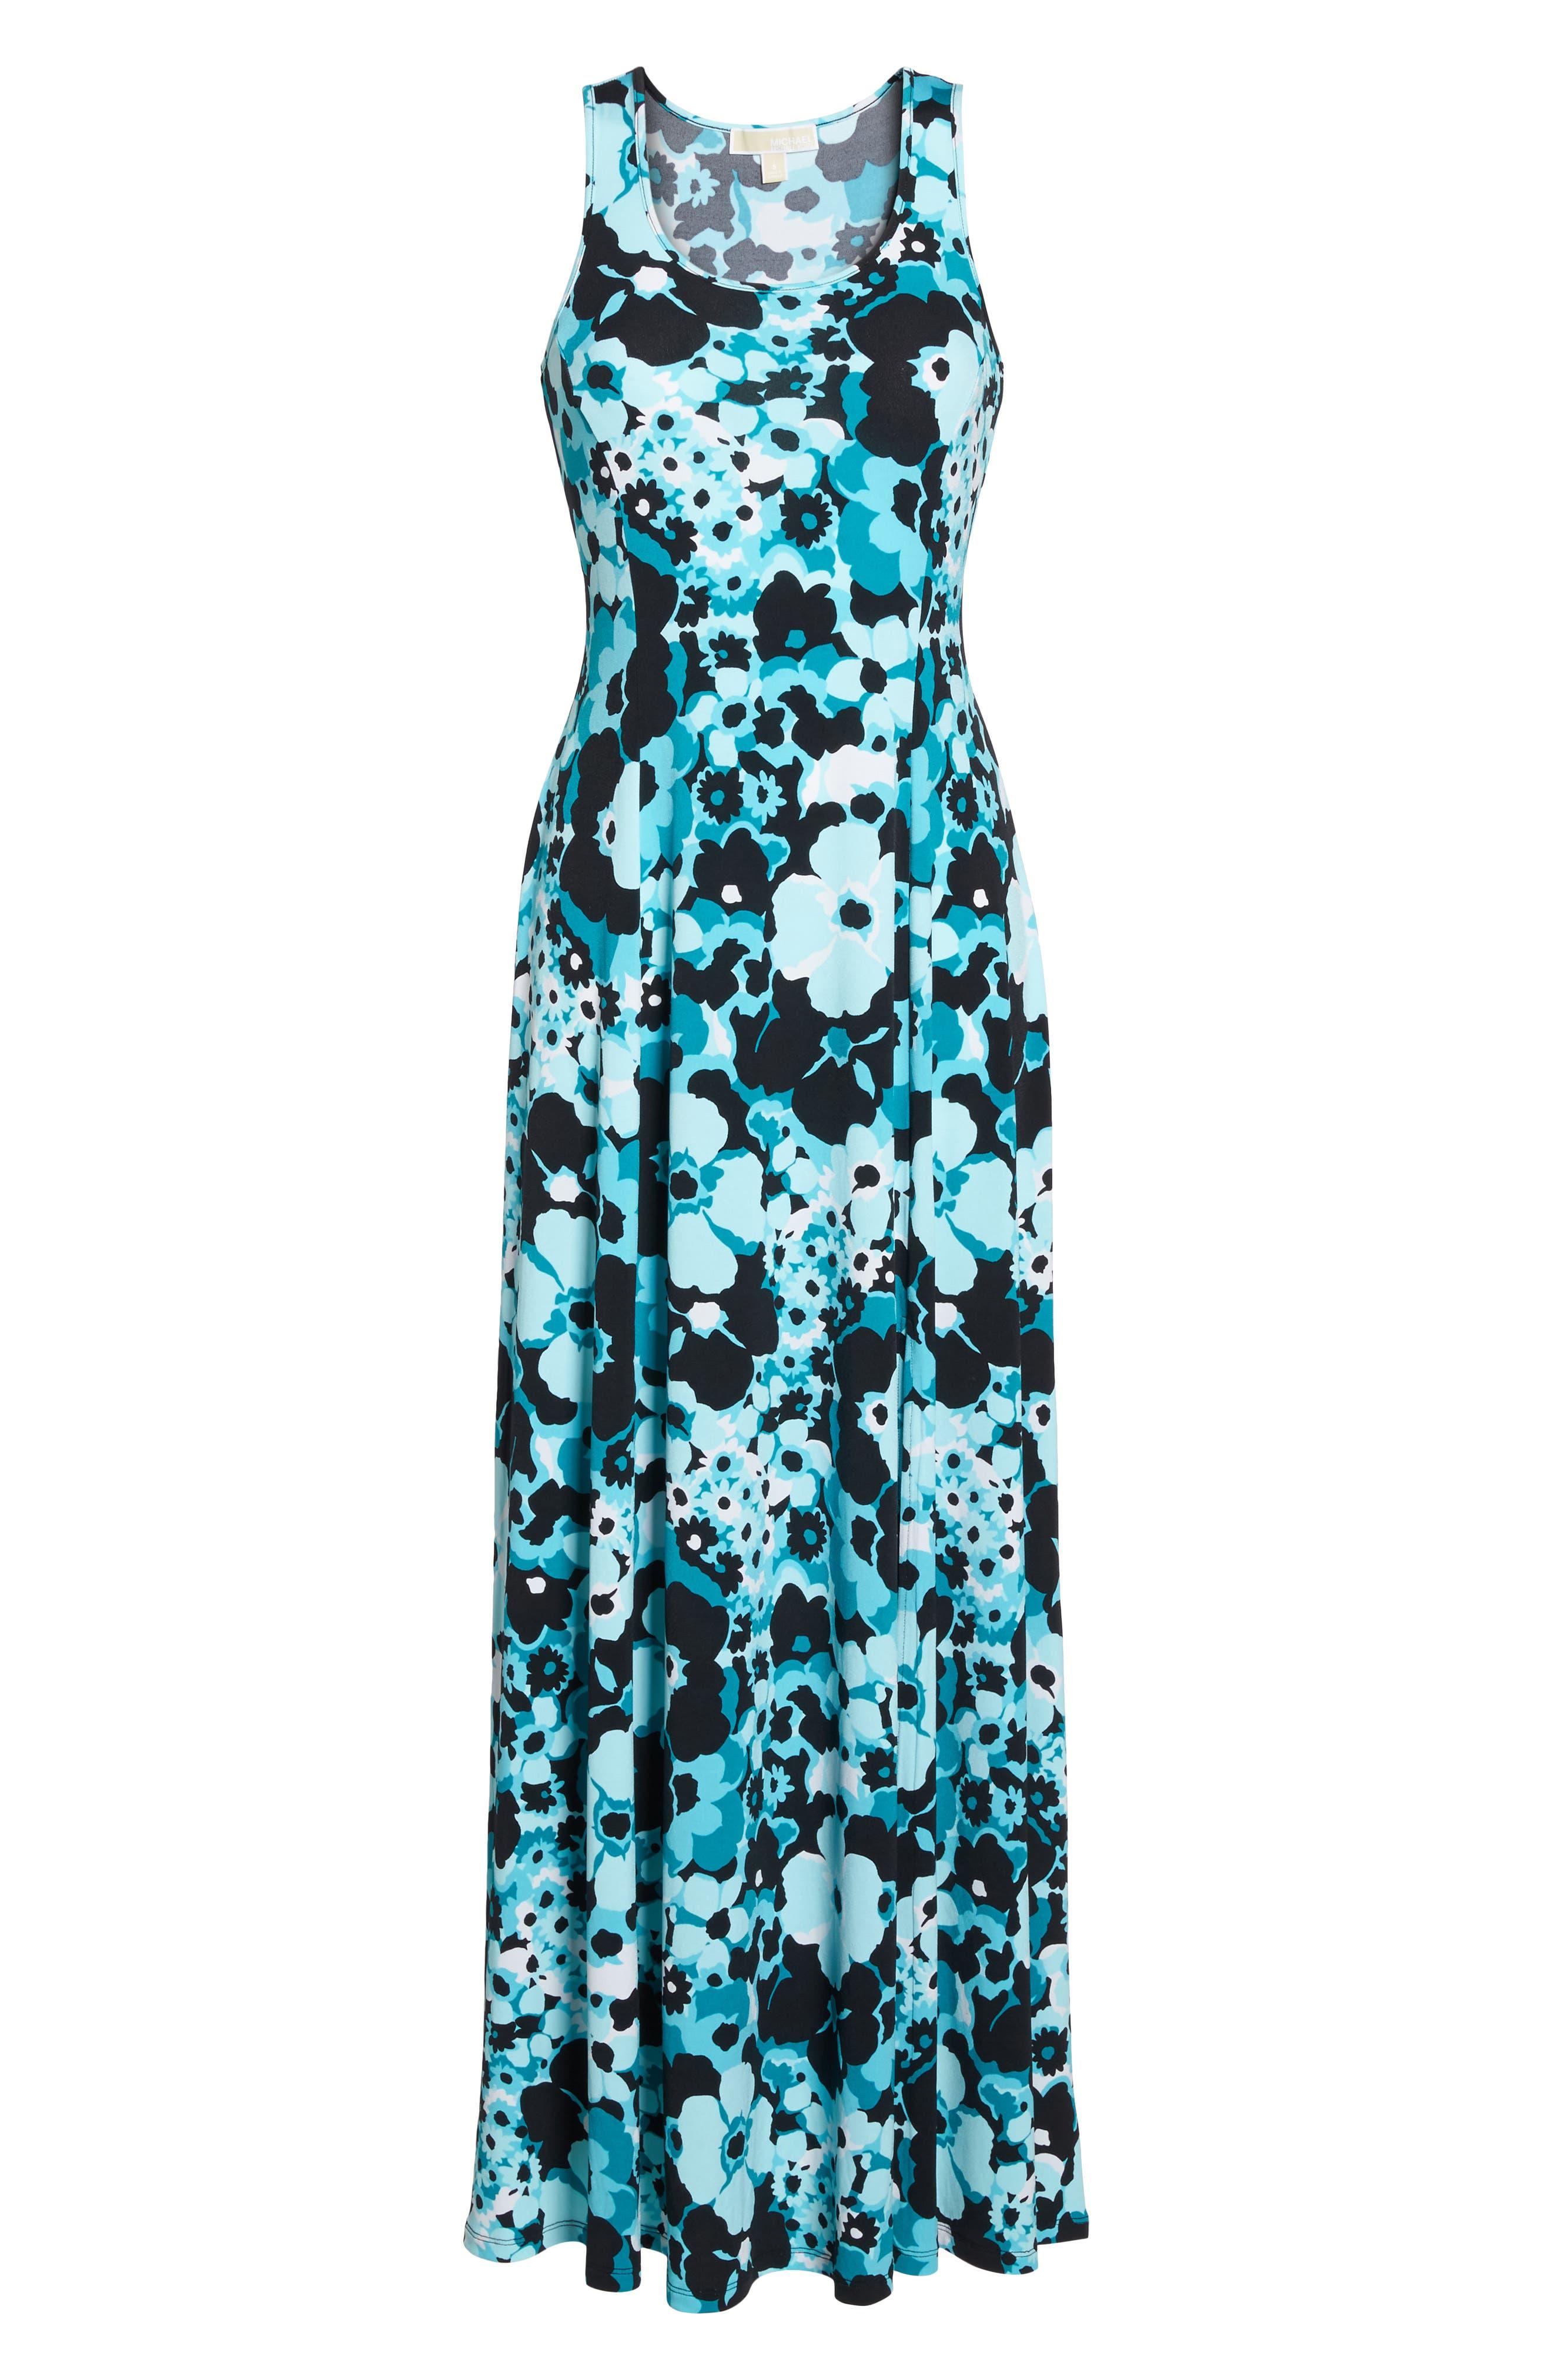 Spring Floral Maxi Dress,                             Alternate thumbnail 6, color,                             494